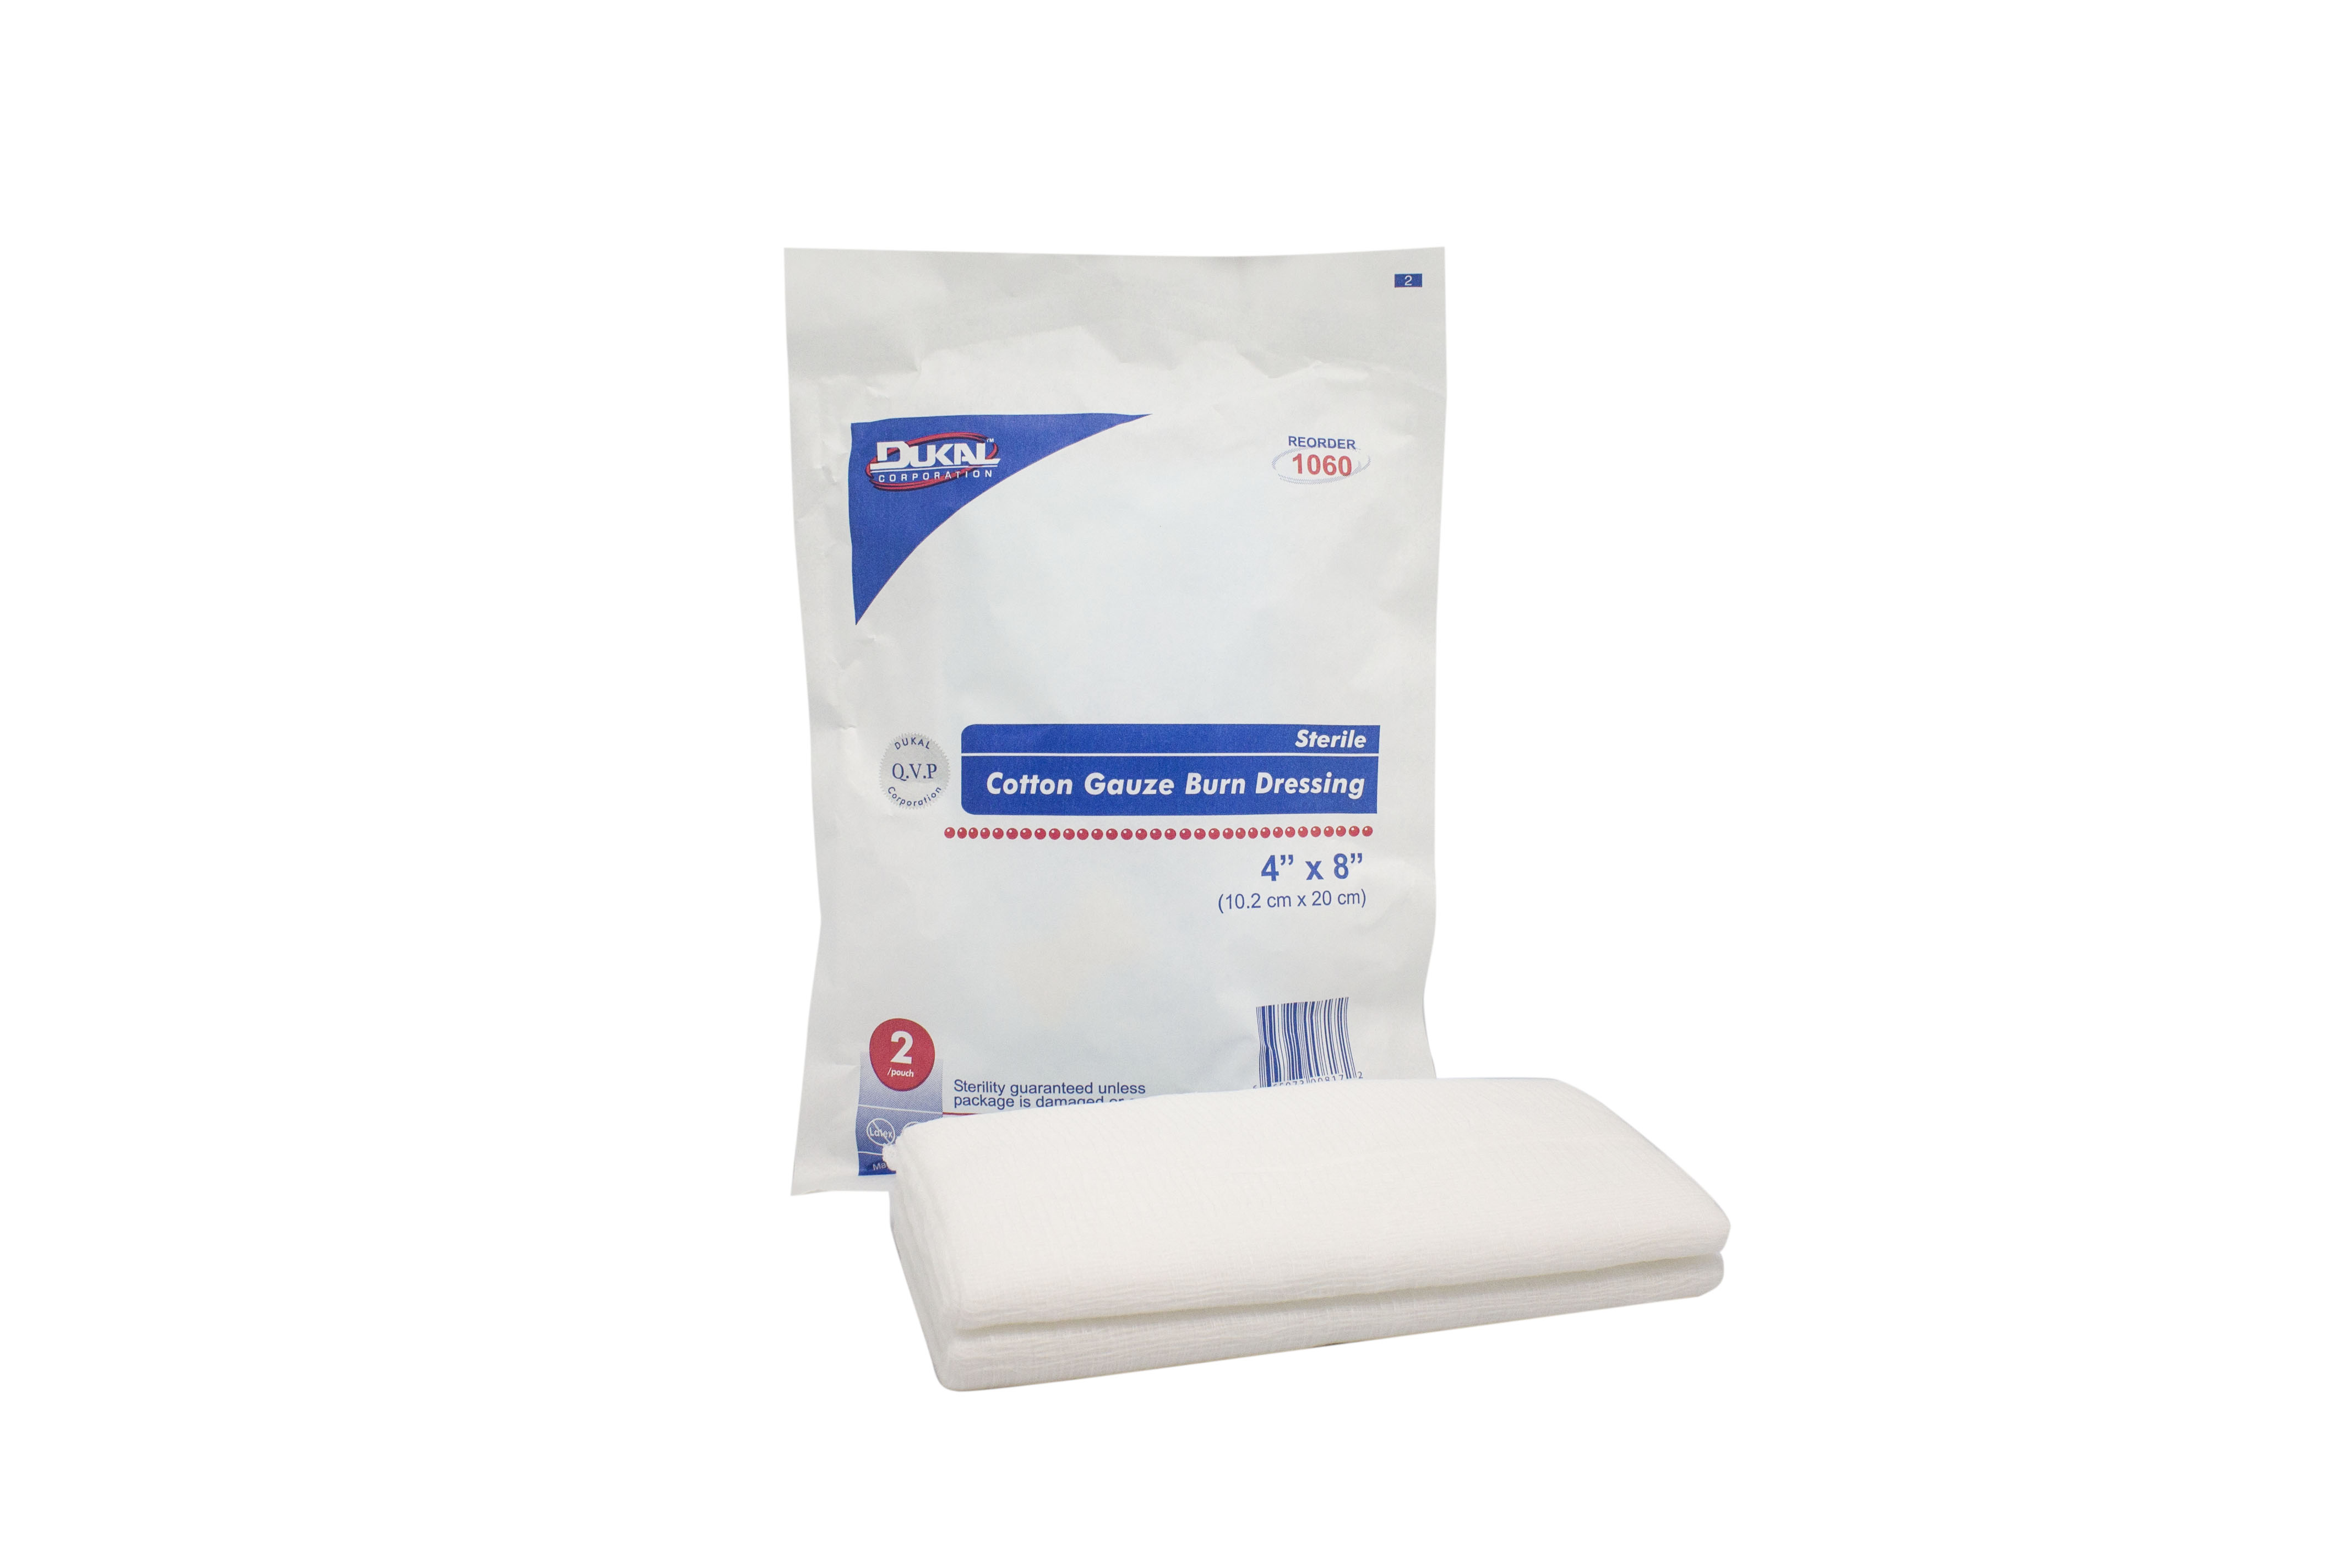 DUKAL Sterile Burn Gauze Pad   AvaCare Medical